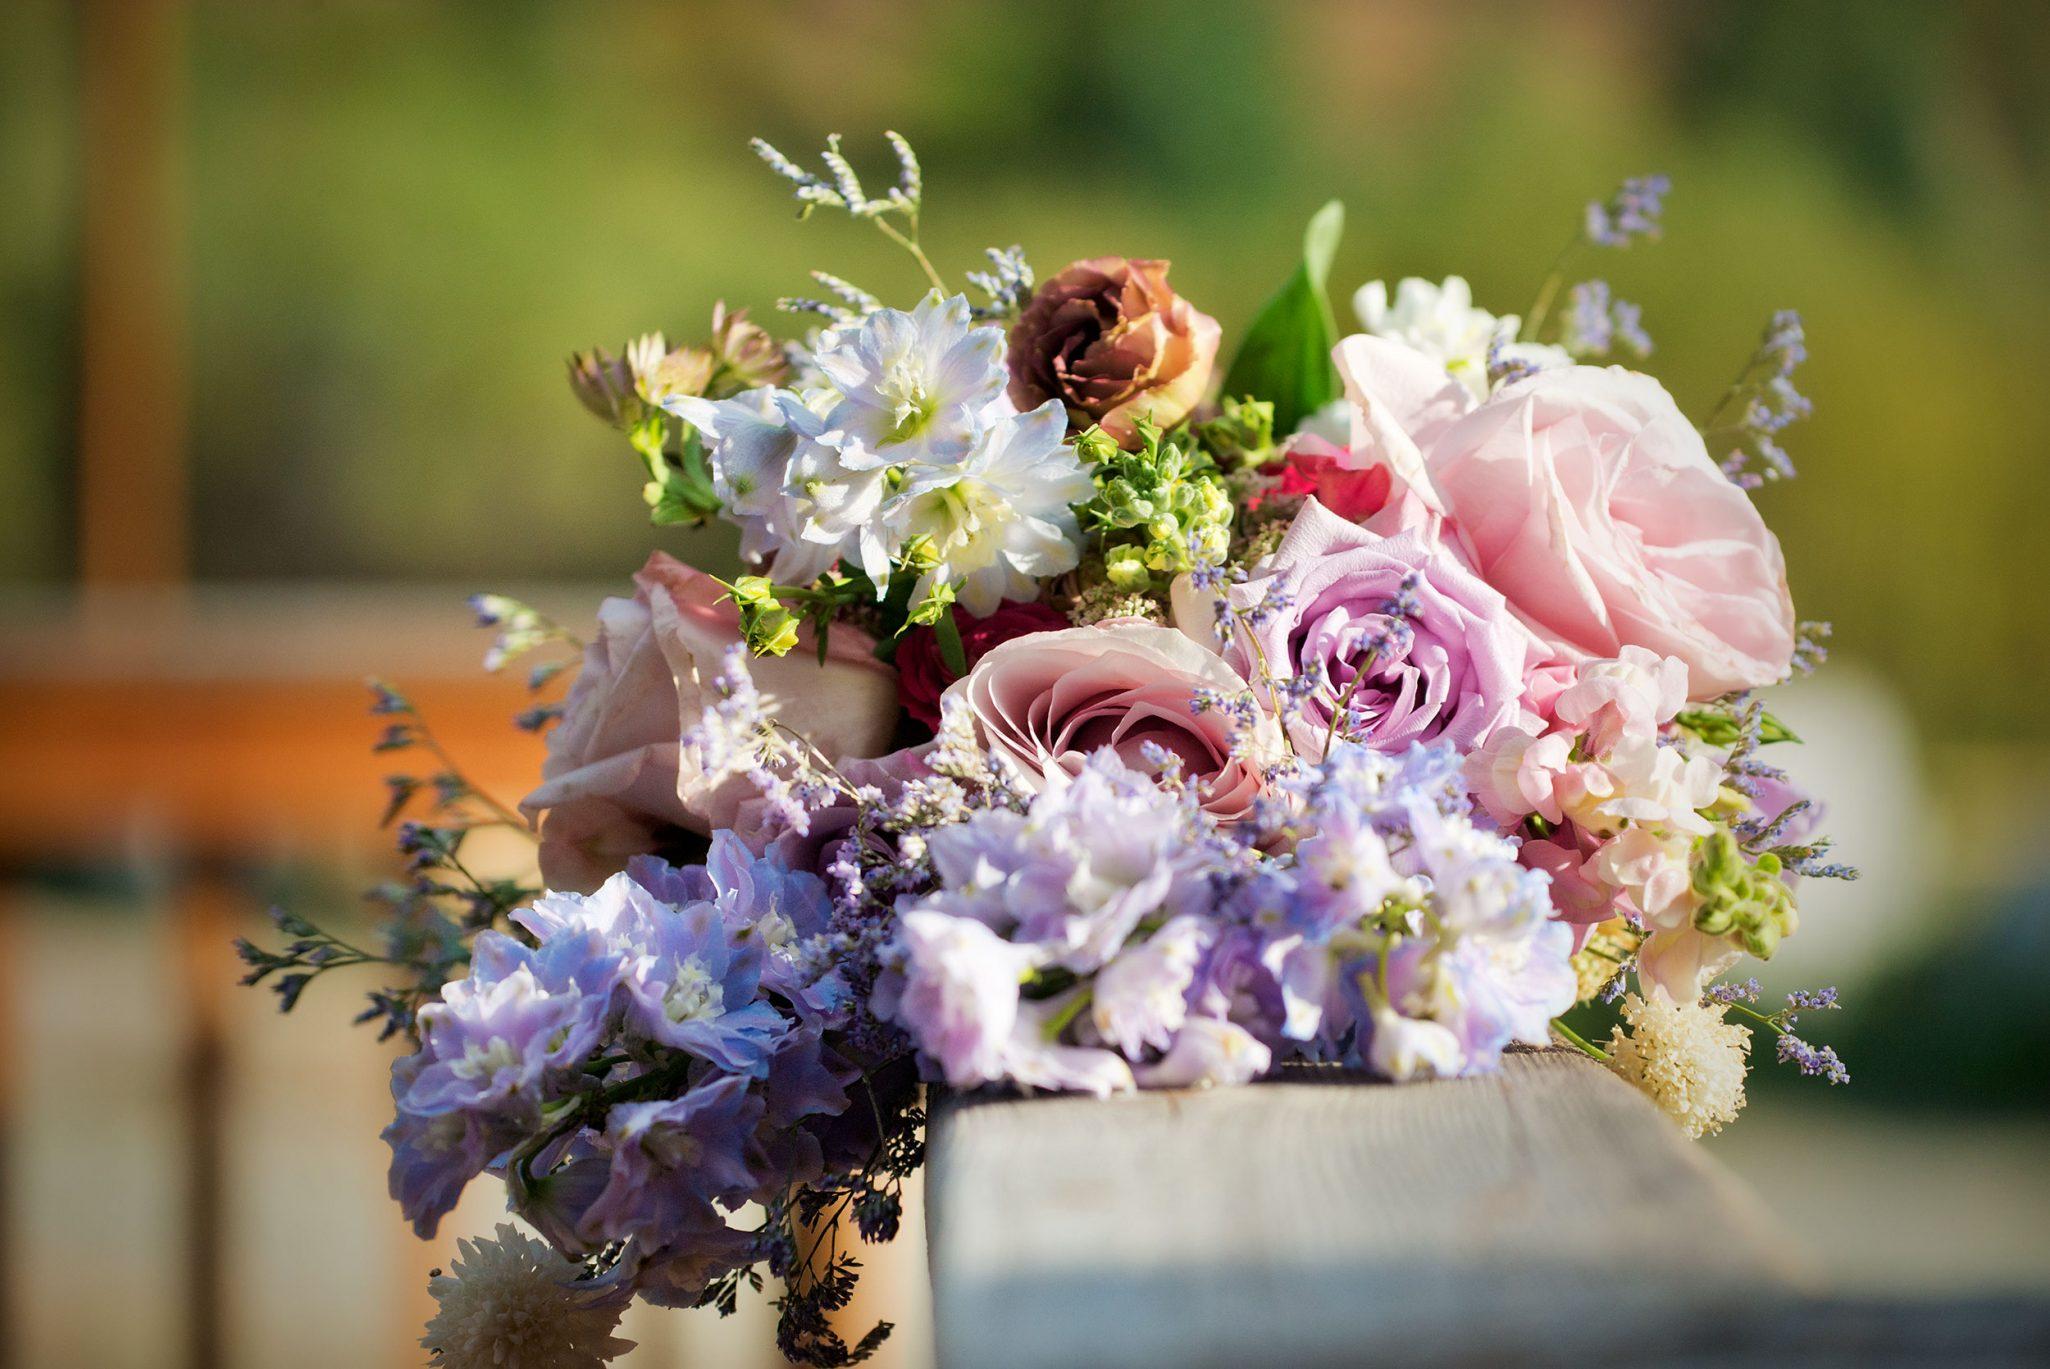 Flower bouquet from Mountain Adventure Wedding in Silverton, Colorado